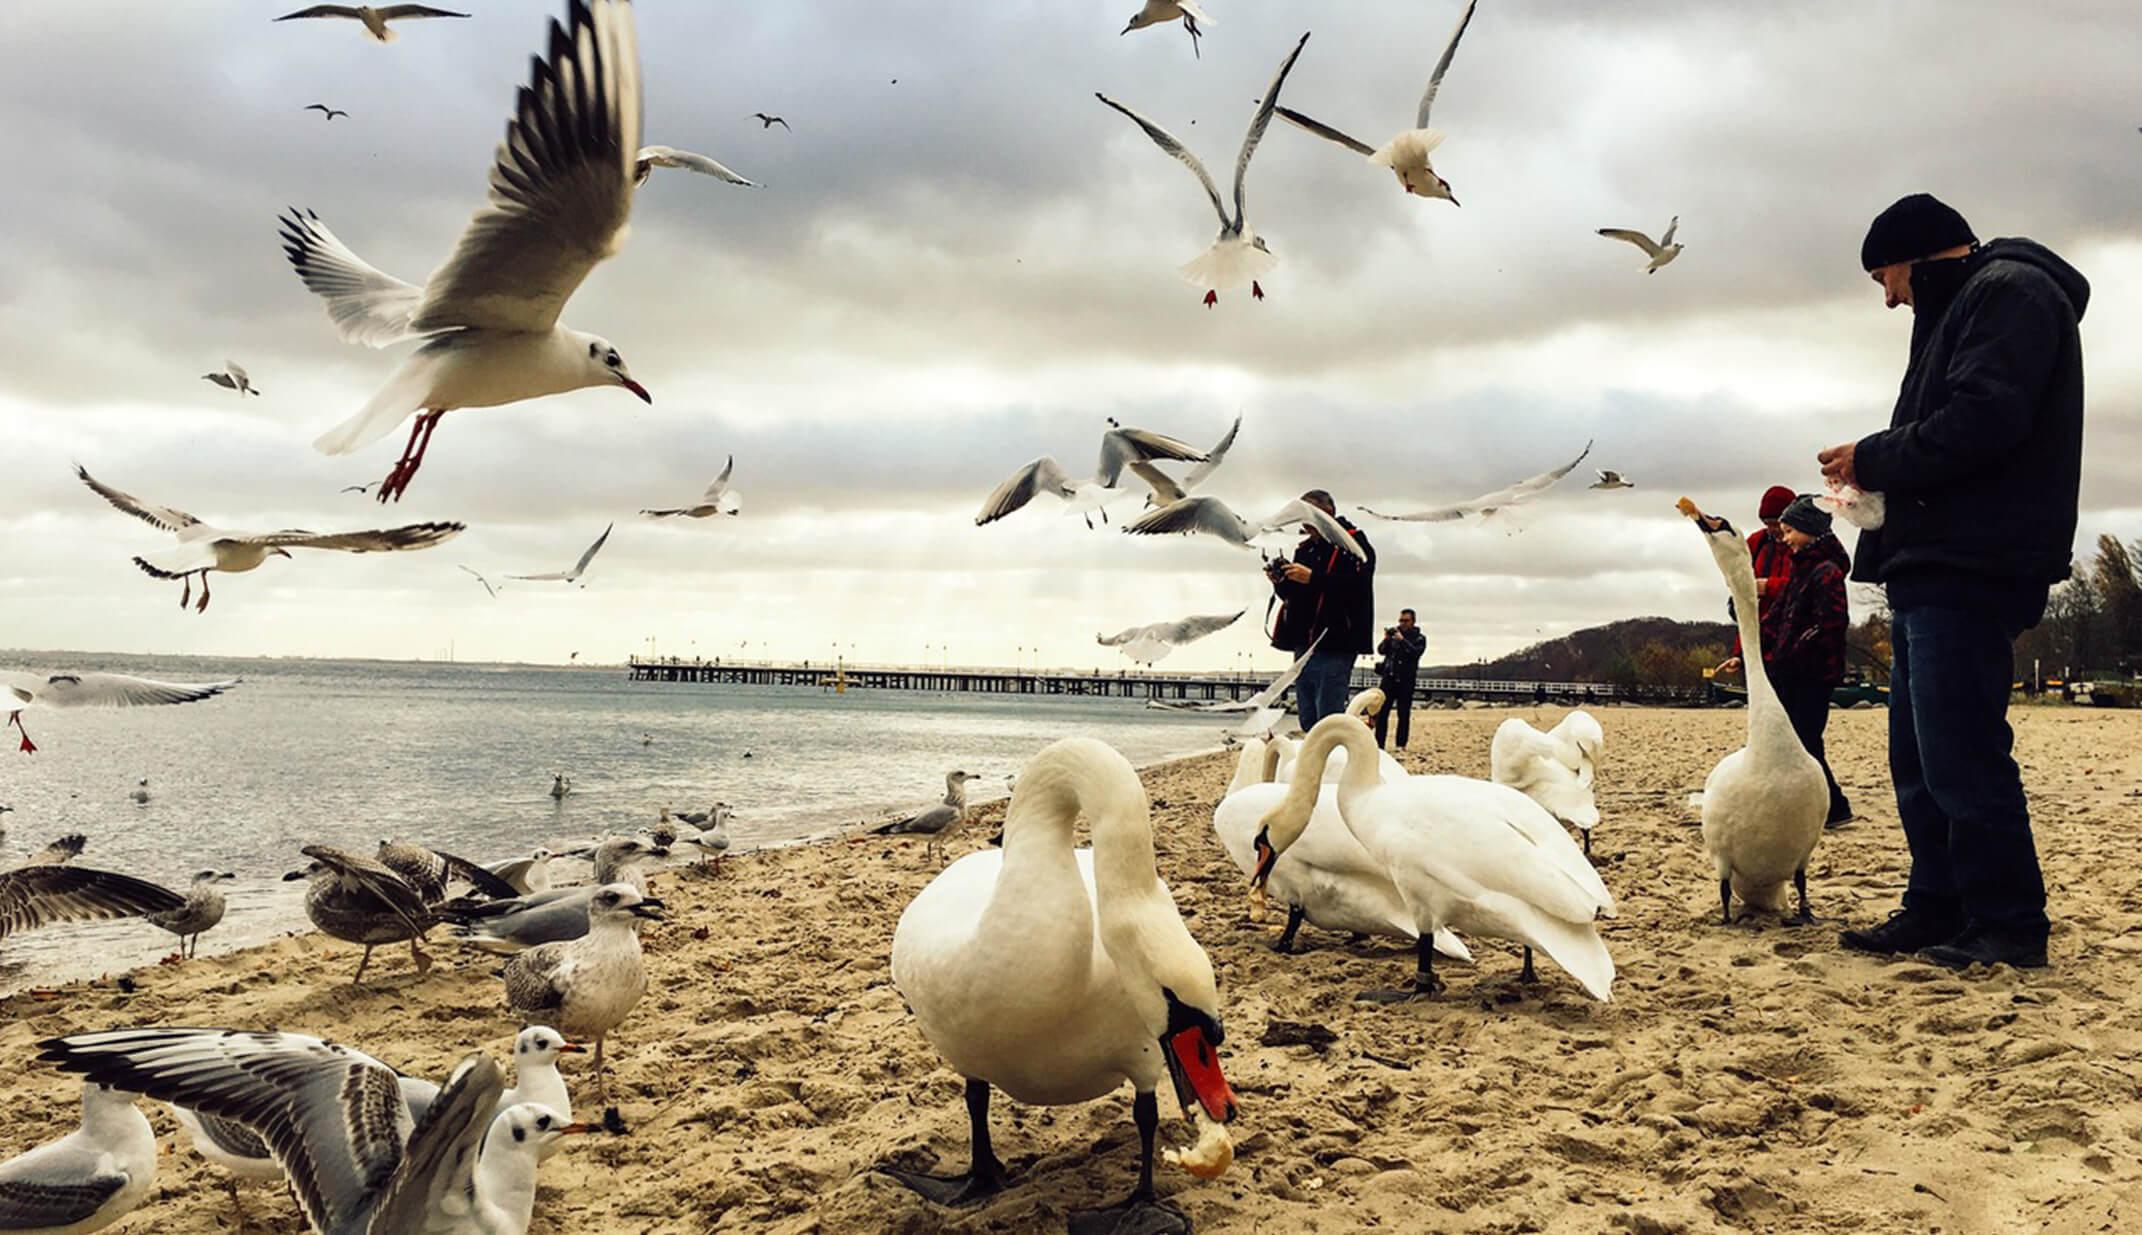 baltic sea birds beach photography photographers funny seagull fall winter poland people adventure